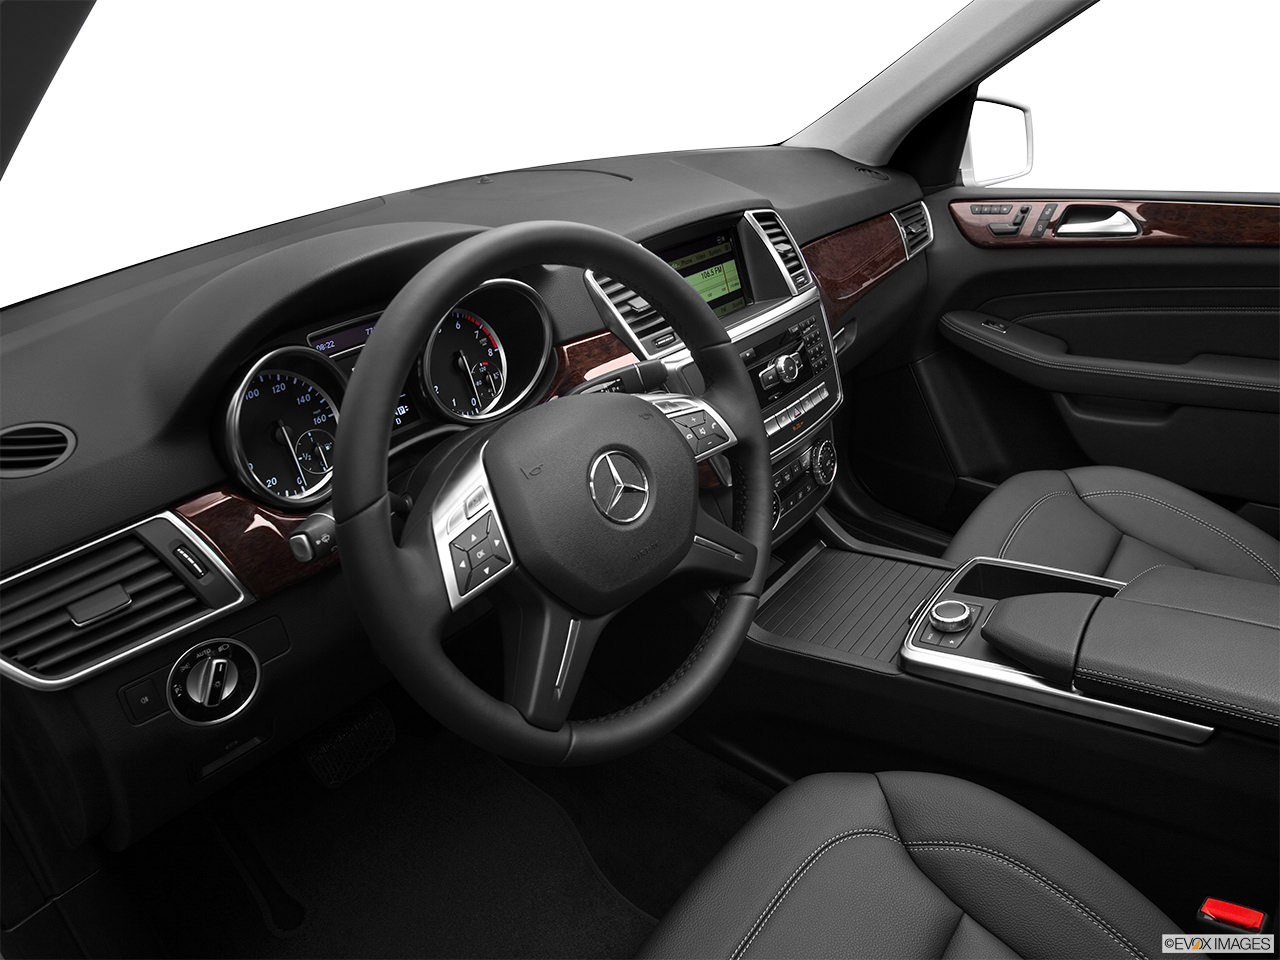 Mercedes M-Class 2012 Interior